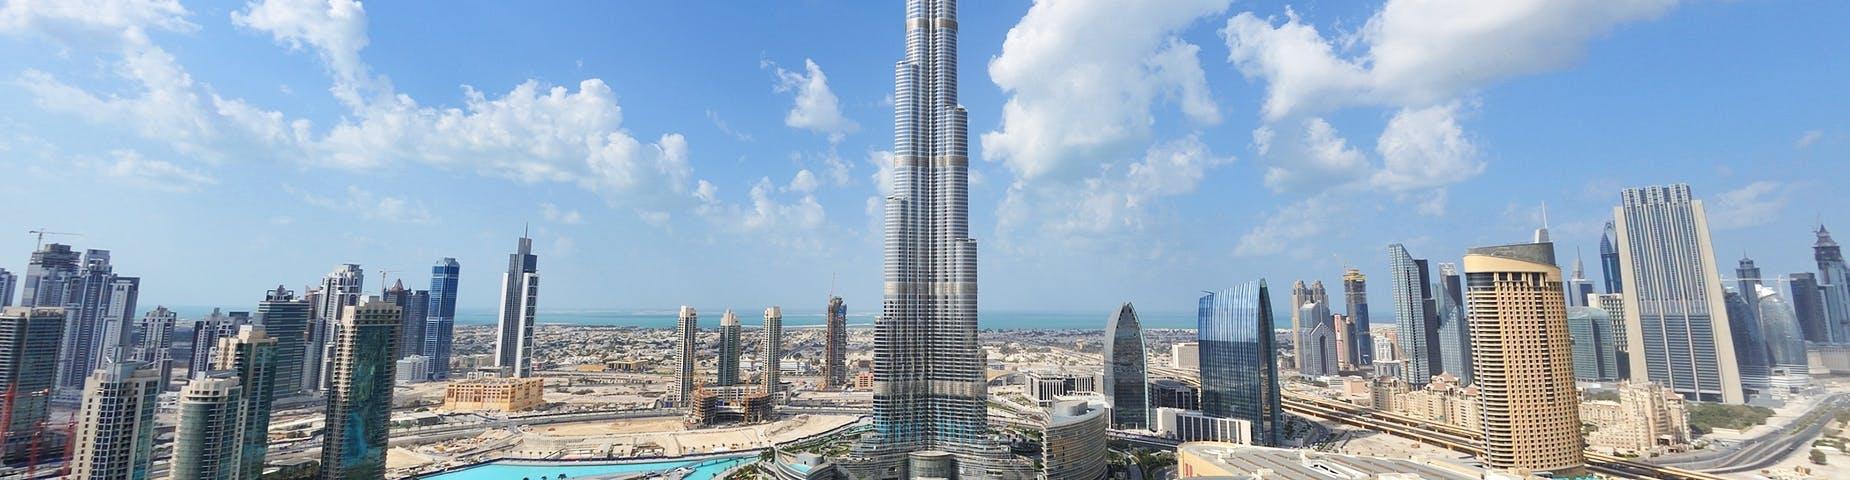 Burj Khalifa Tickets And Tours In Dubai Musement